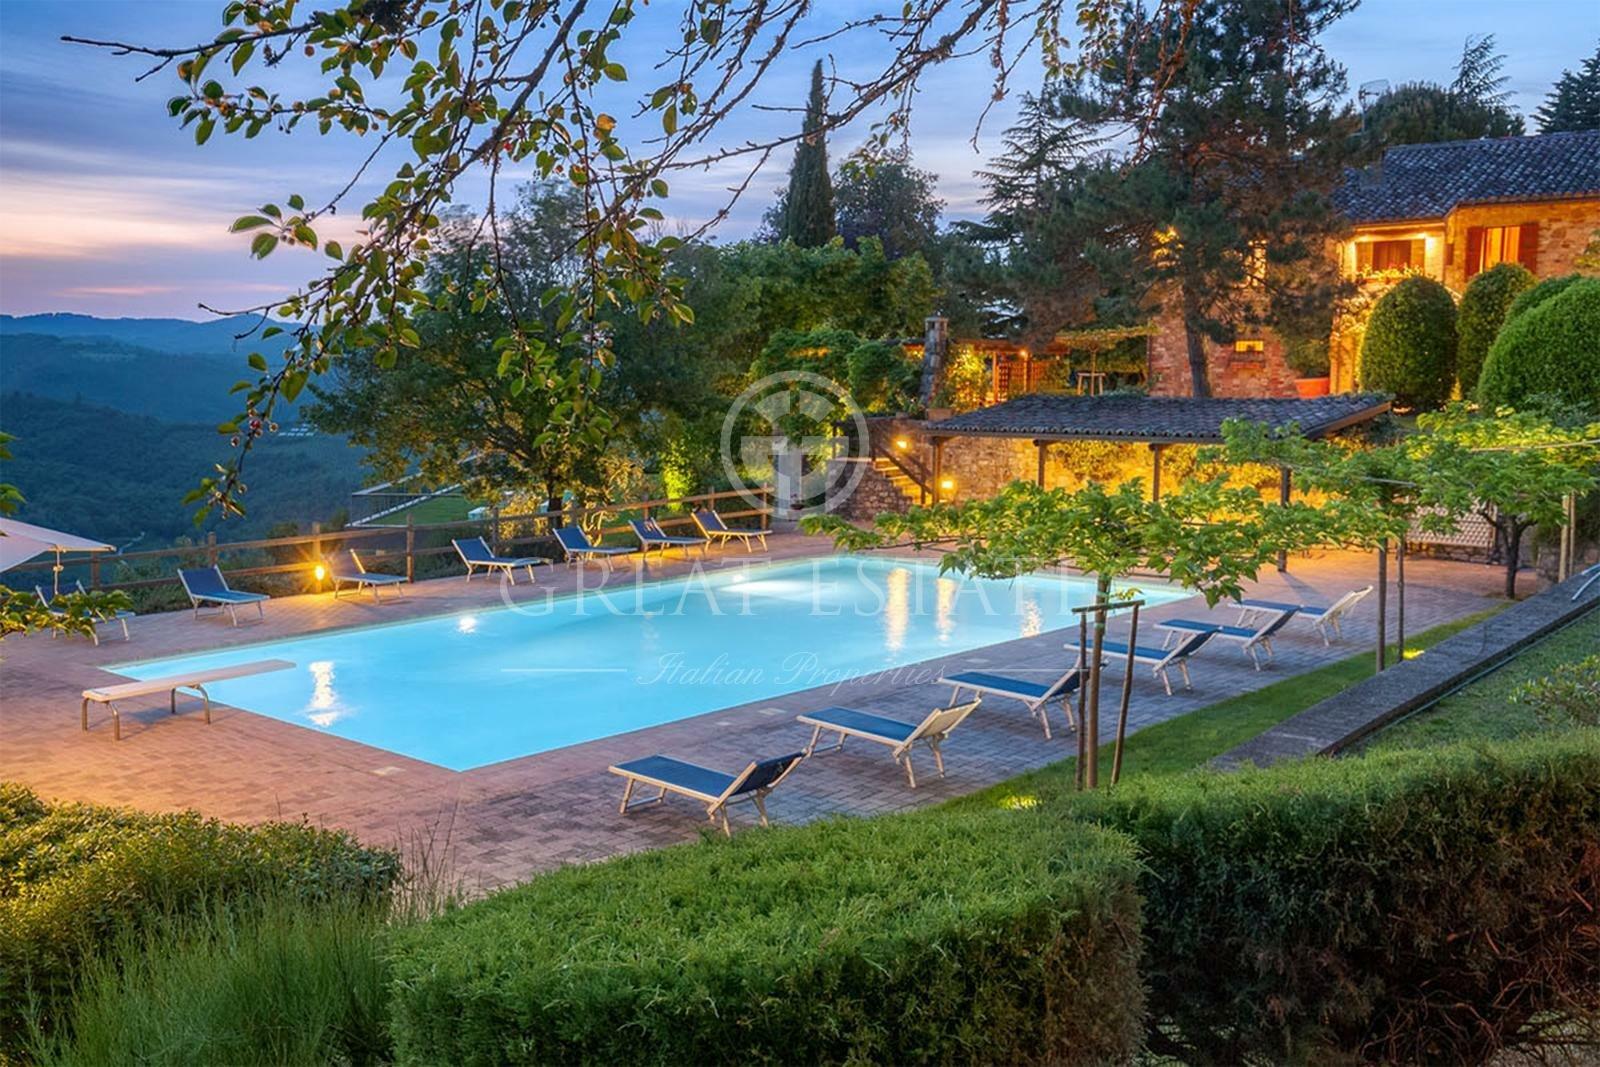 Estate in Monte Castello di Vibio, Umbria, Italy 1 - 10673529